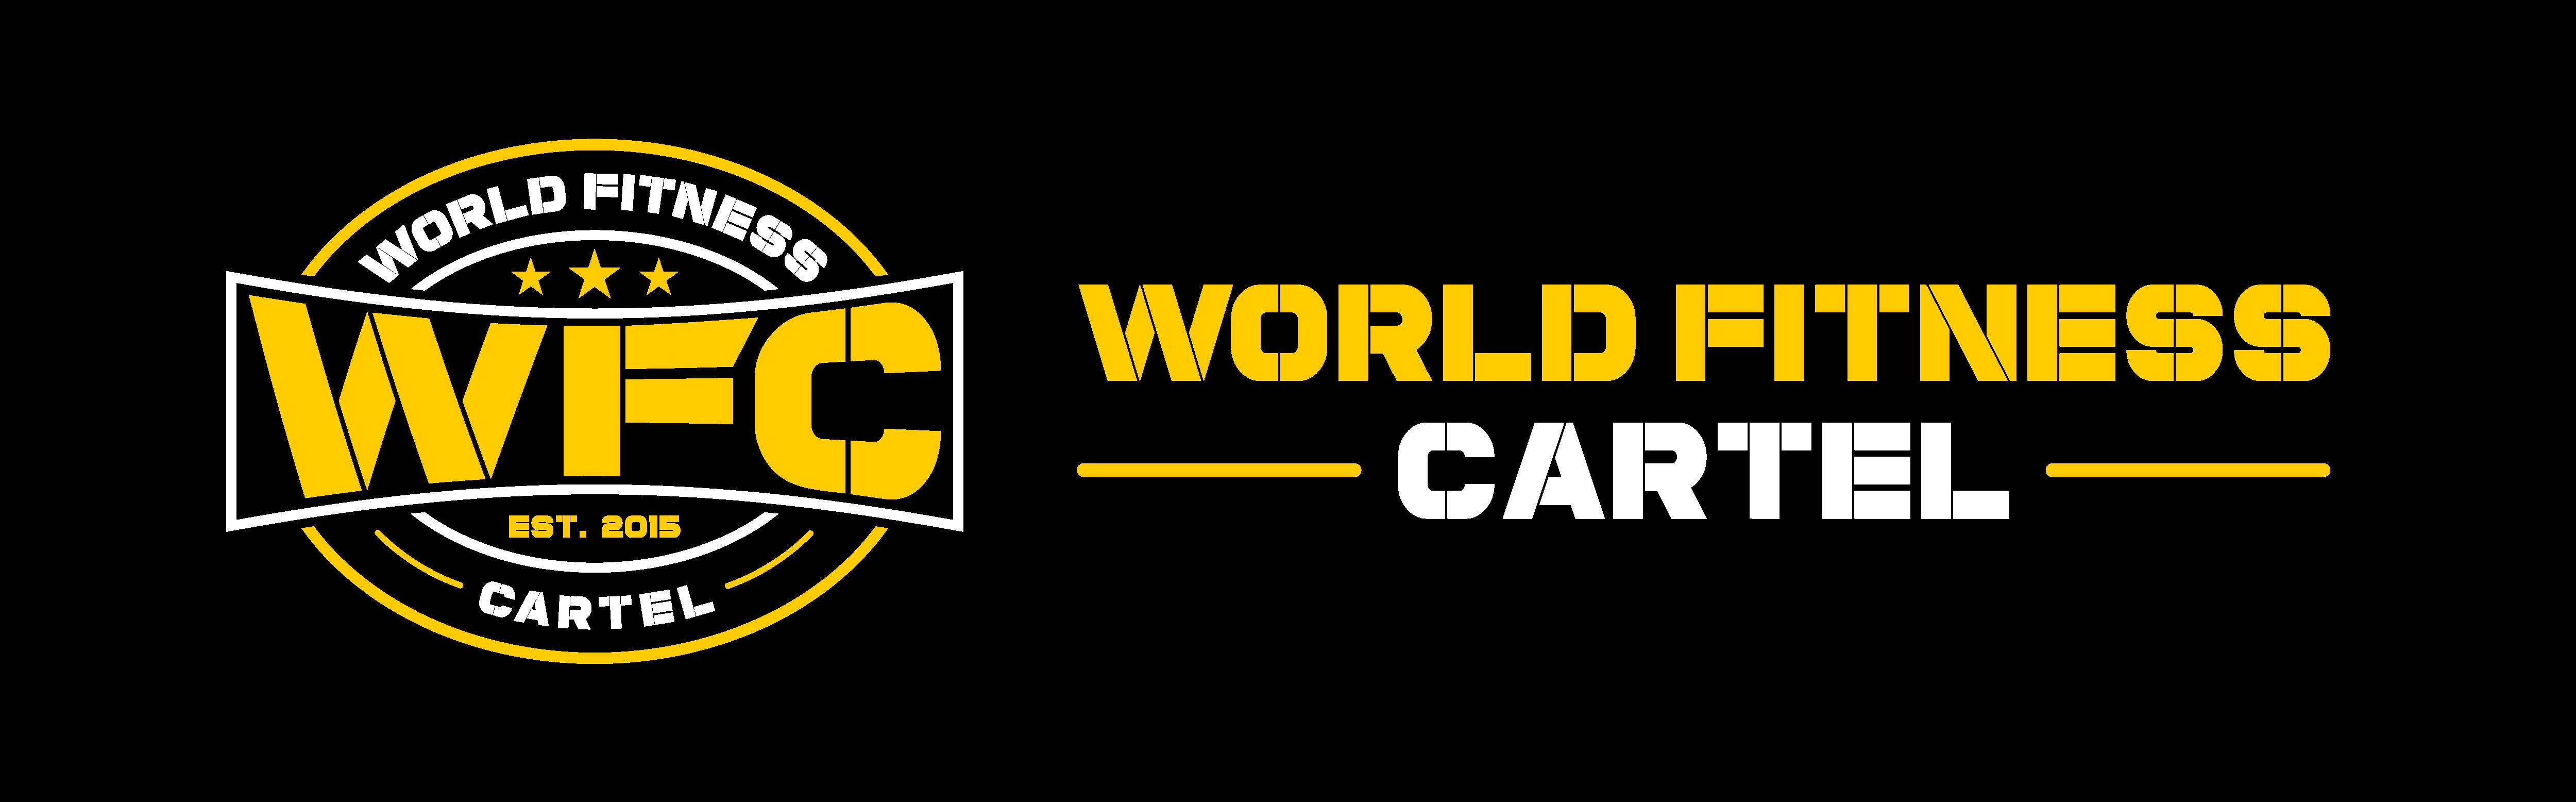 World Fitness Cartel